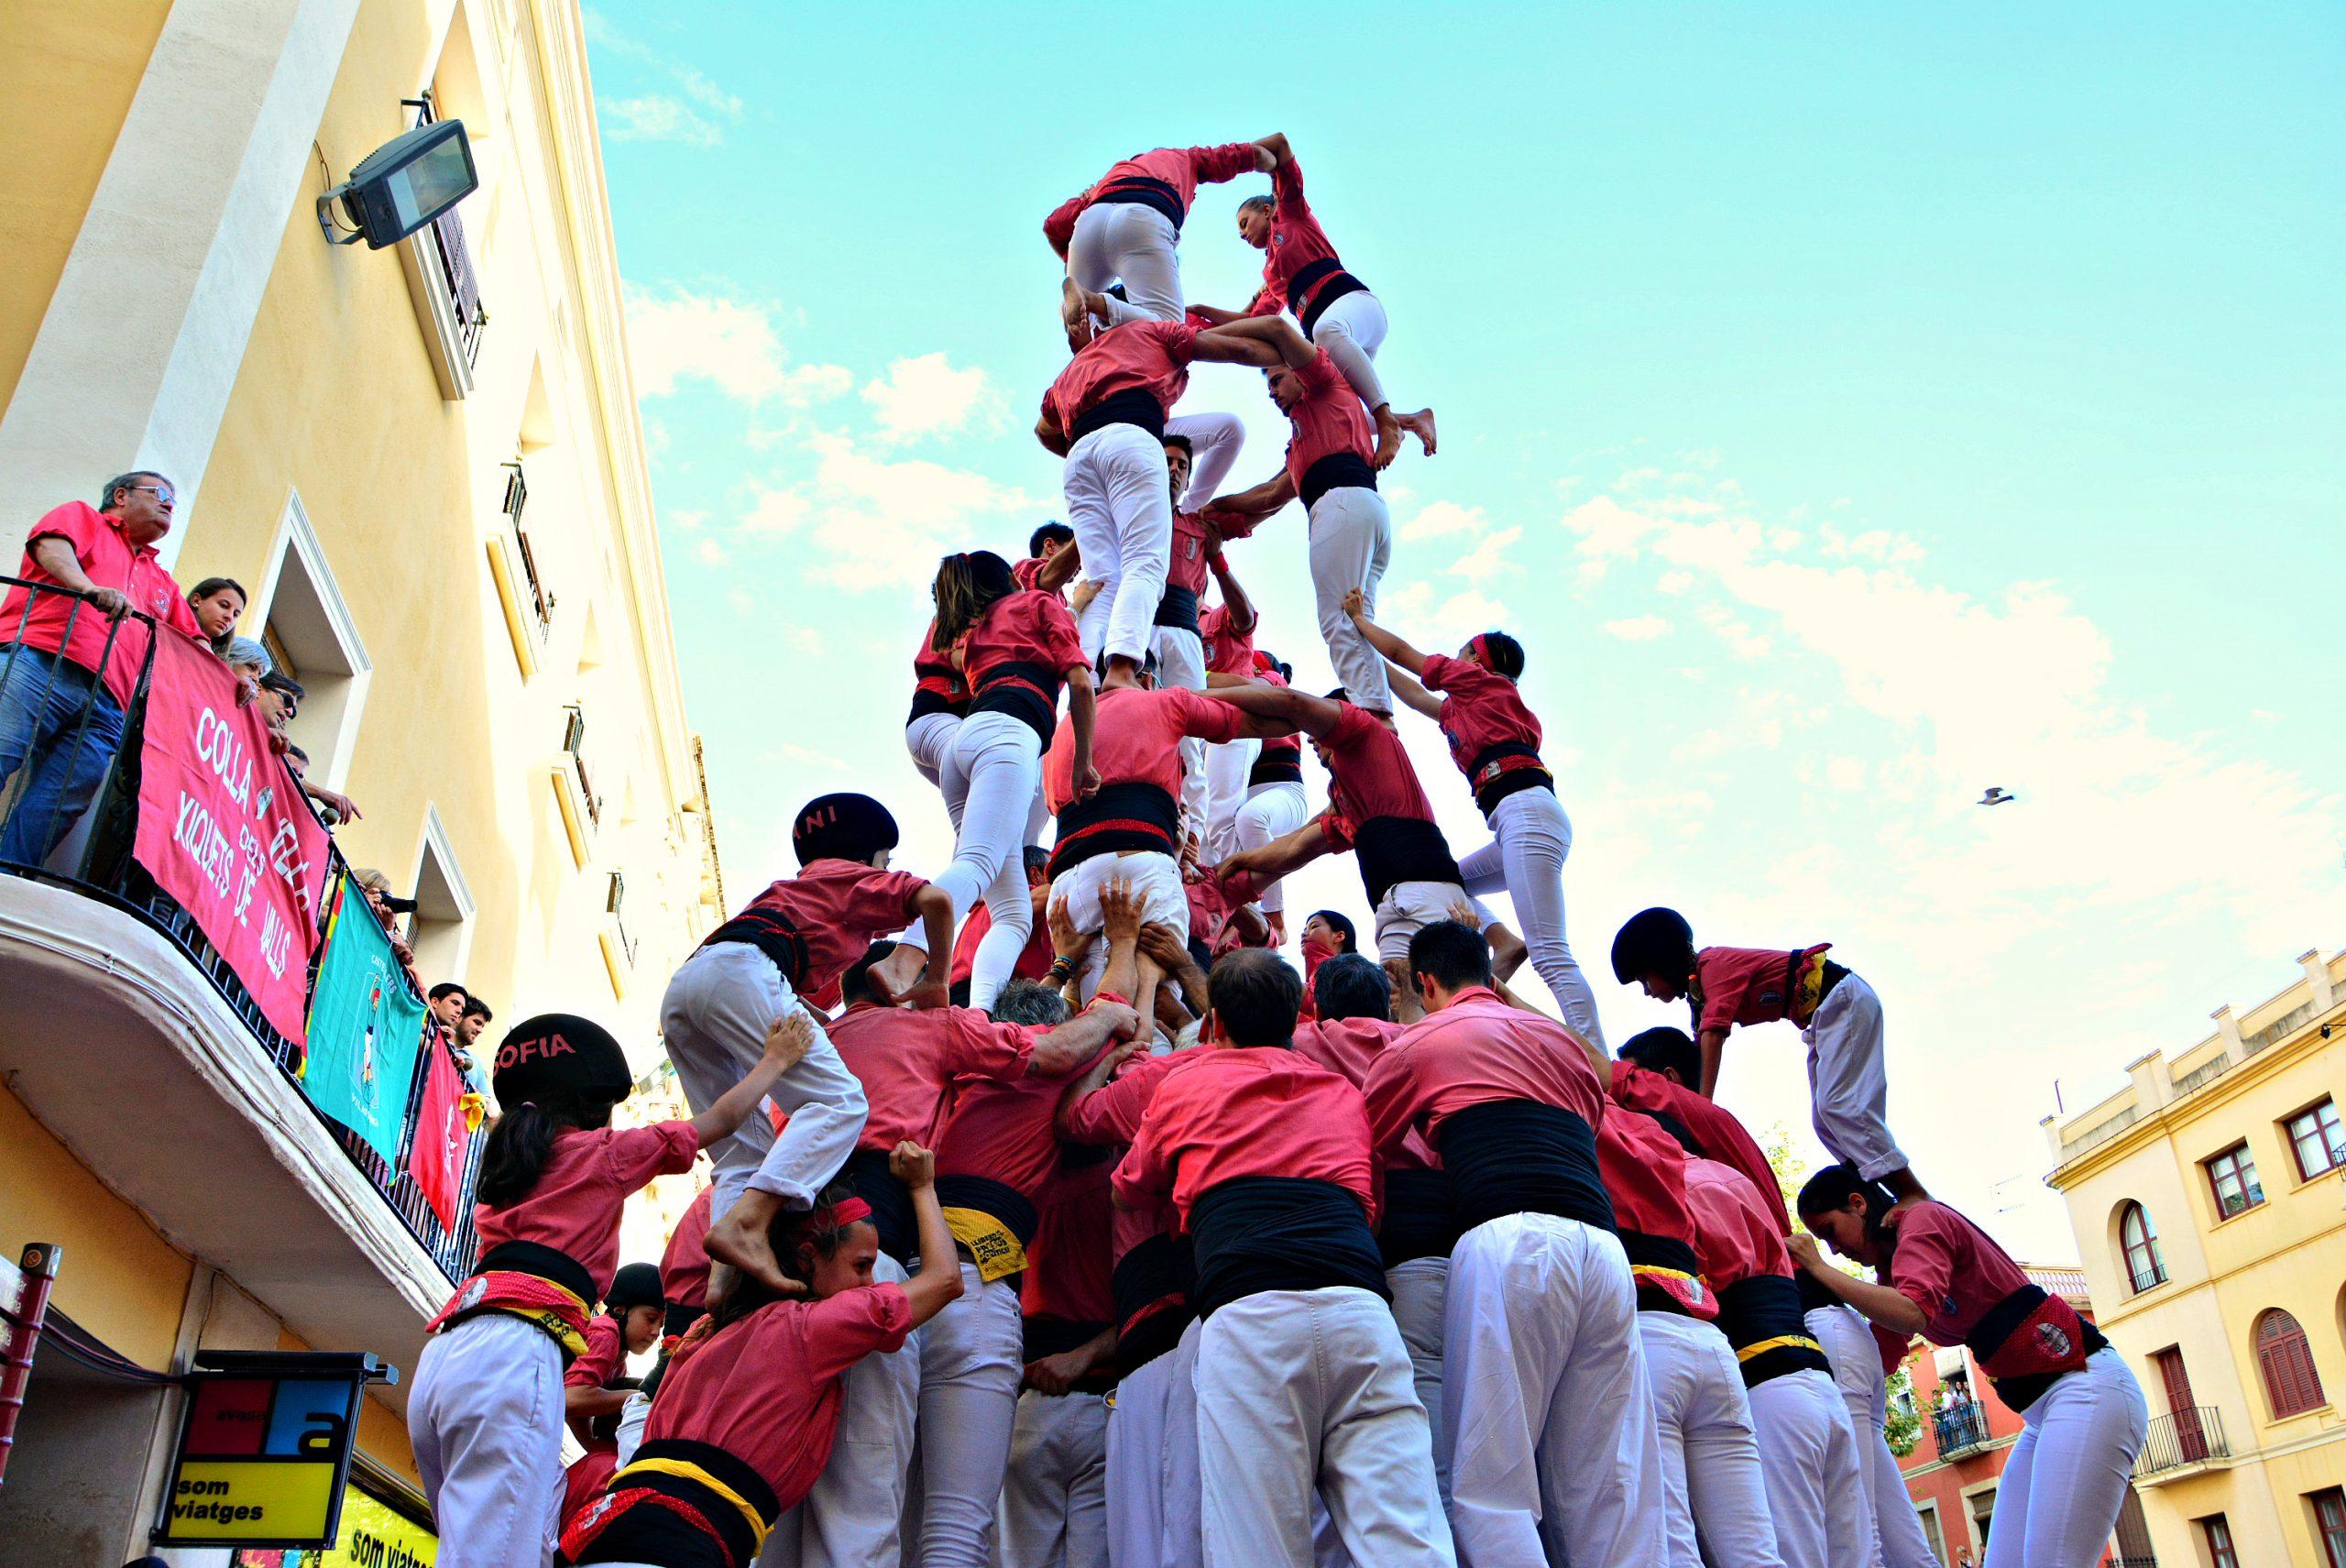 Festes de la Mercè med människopyramider i Barcelona